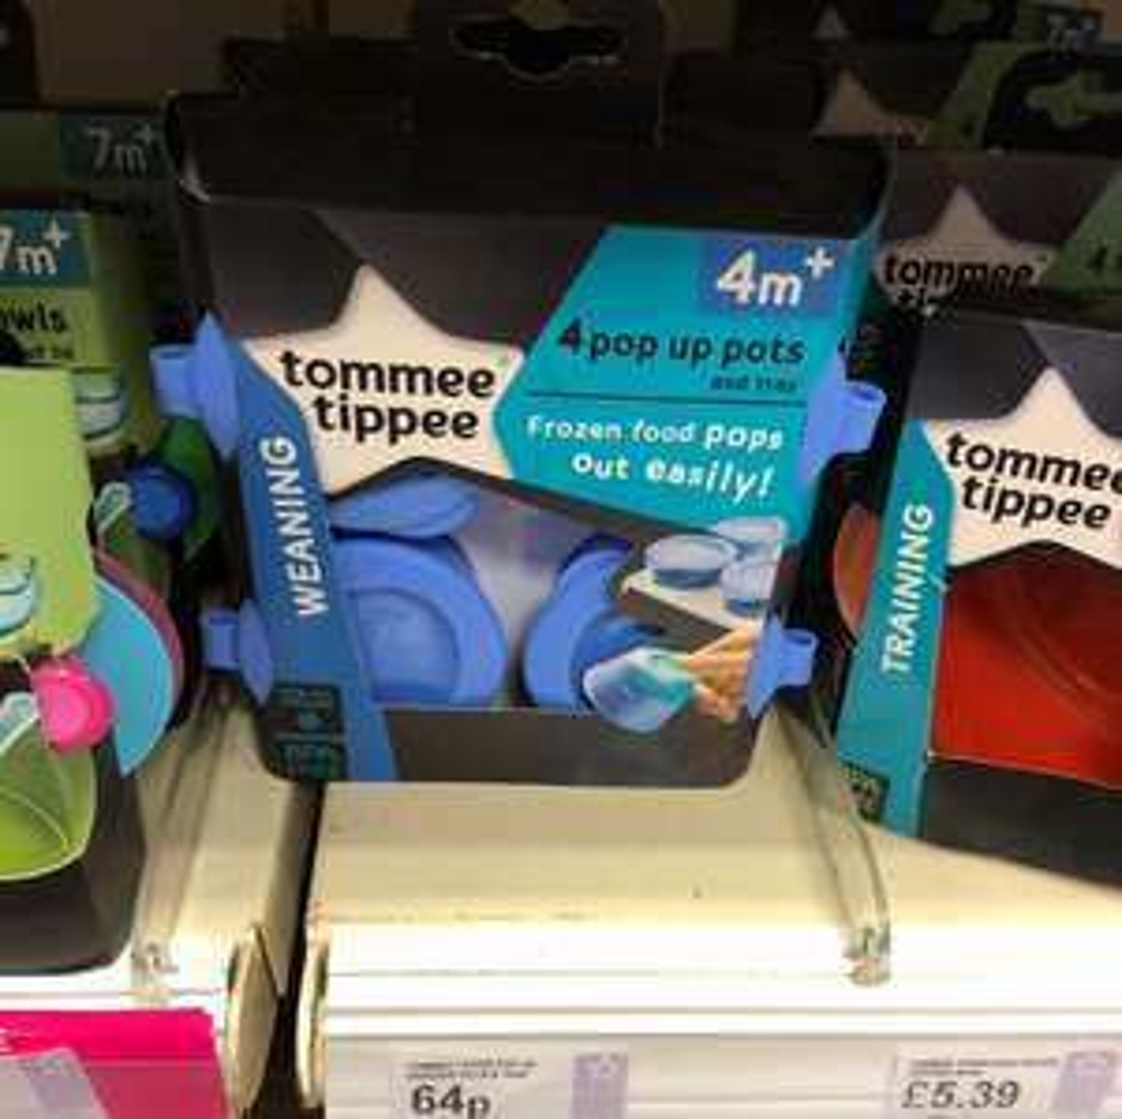 Tommee tippee pop up freezer pots 64p superdrug instore only bexleyheath